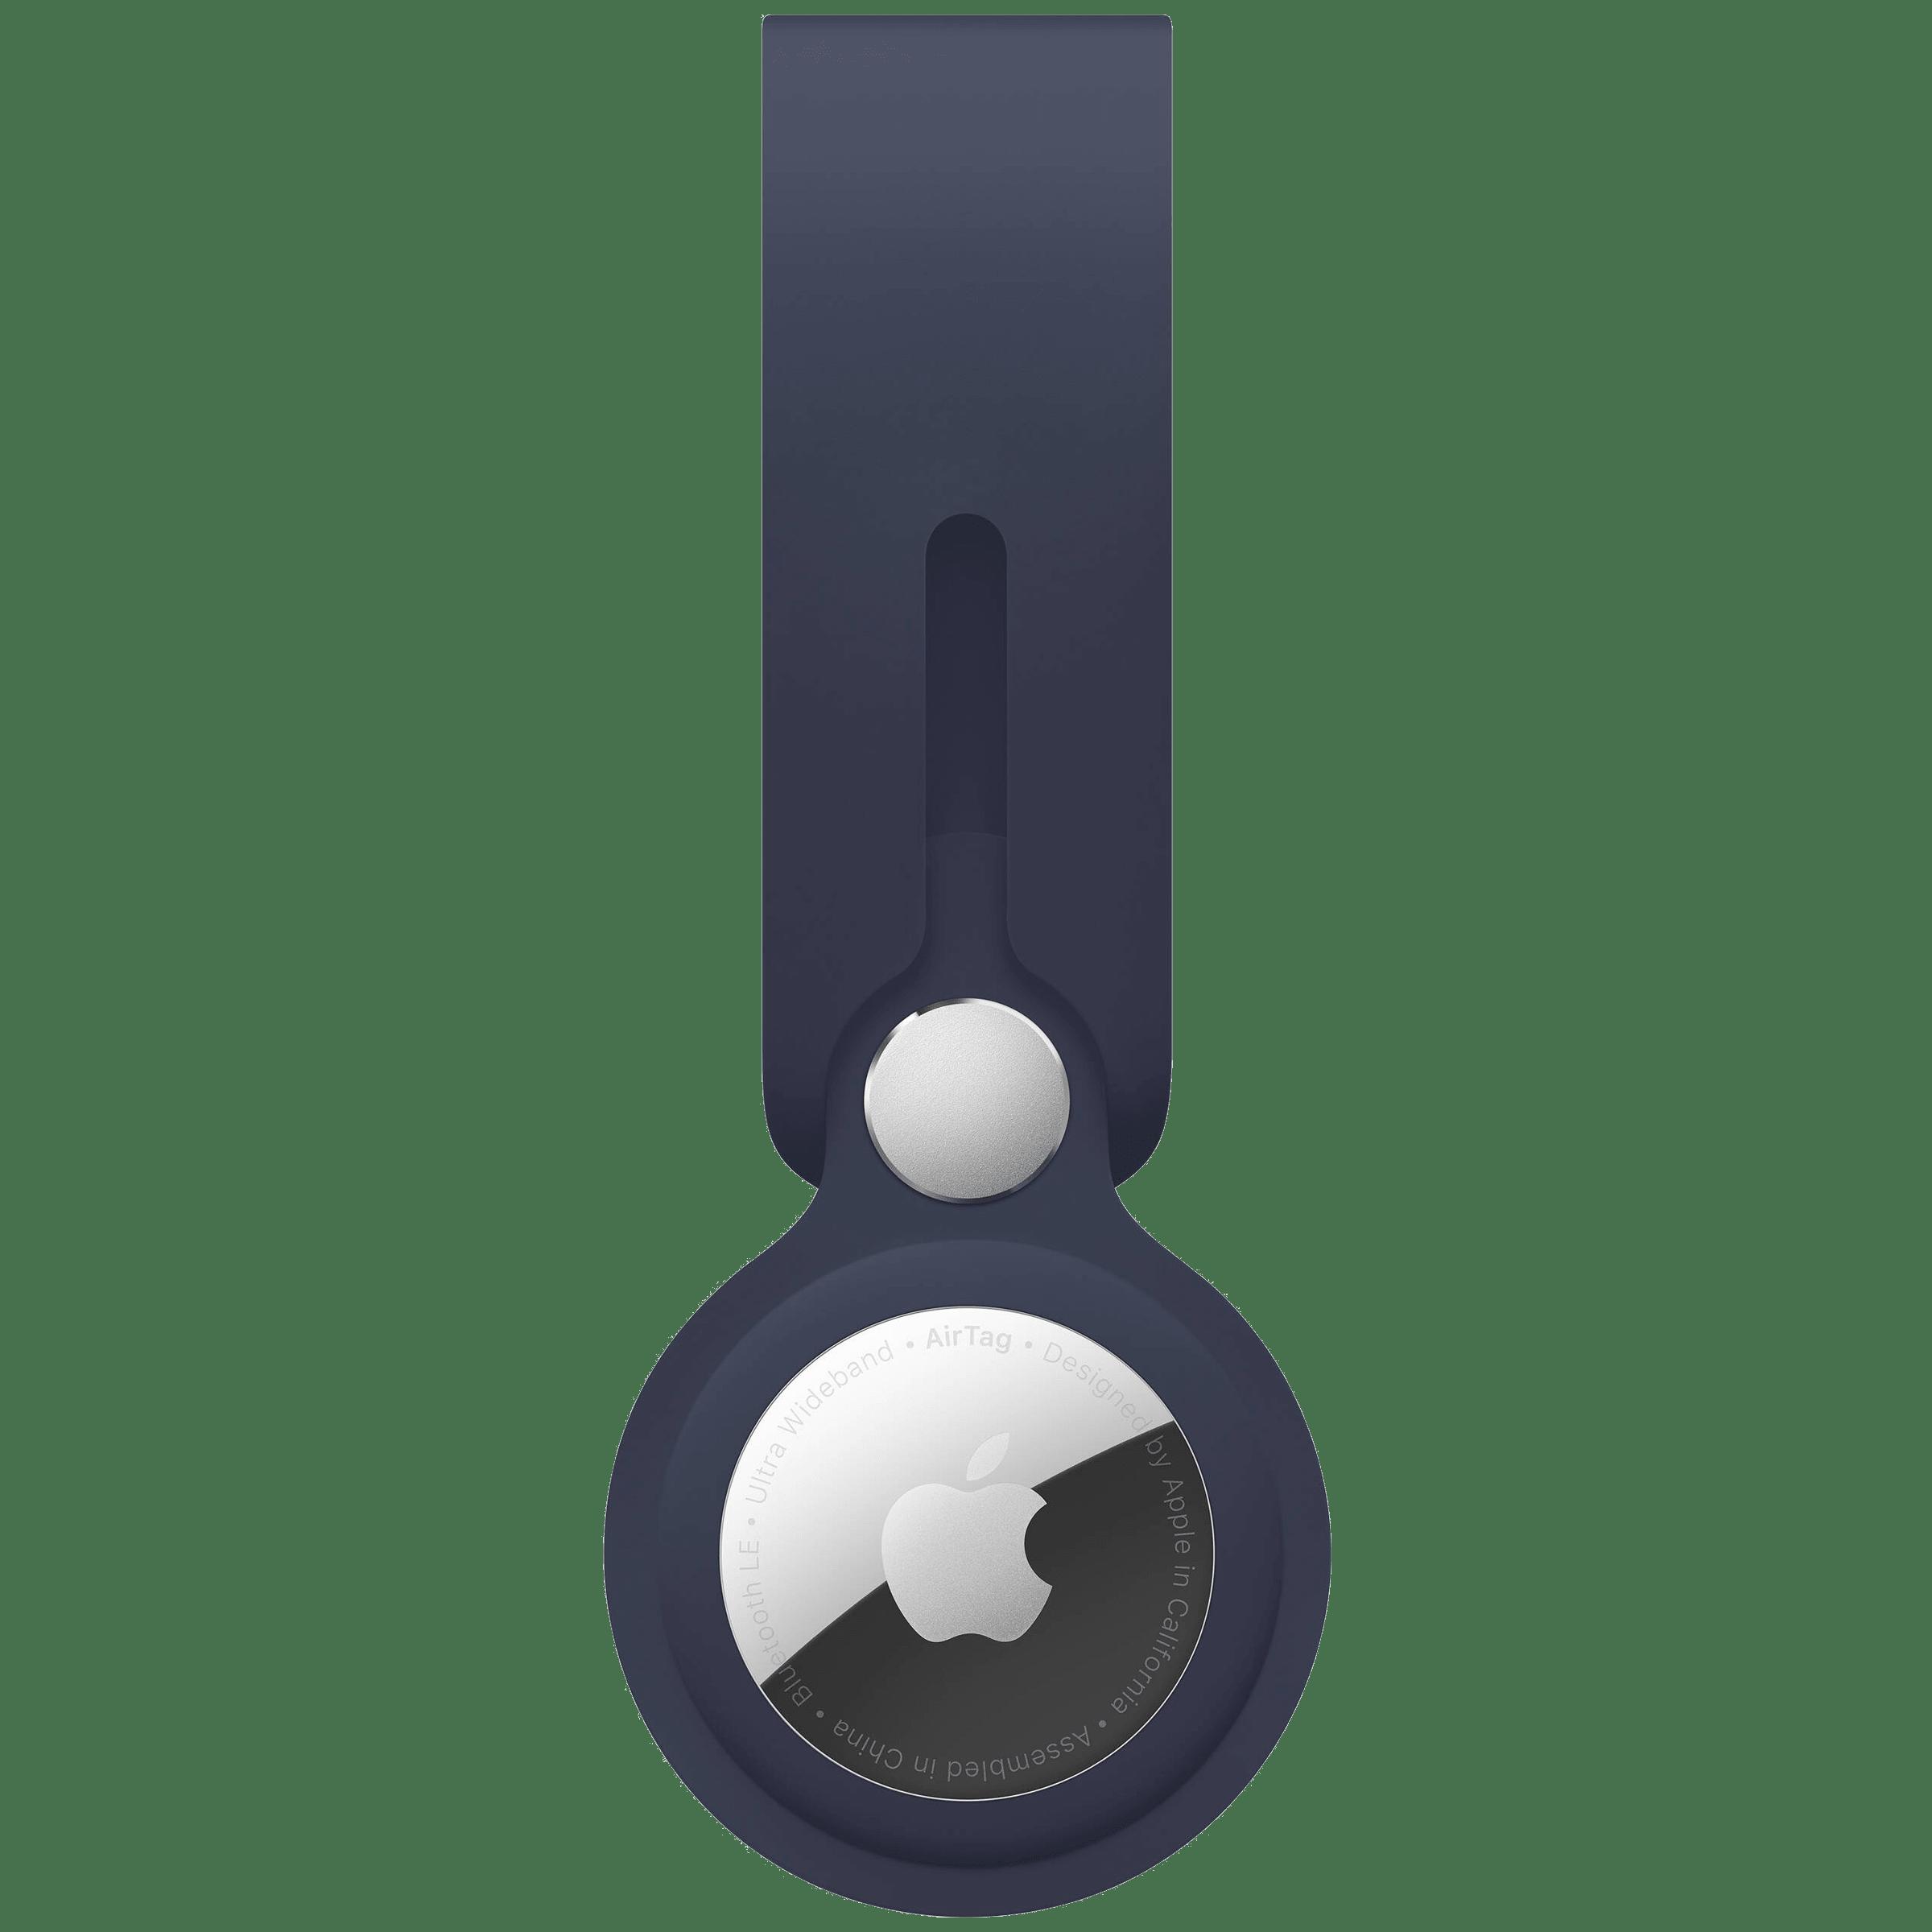 Apple AirTag Loop (Lightweight and Durable, MHJ03ZM/A, Deep Navy)